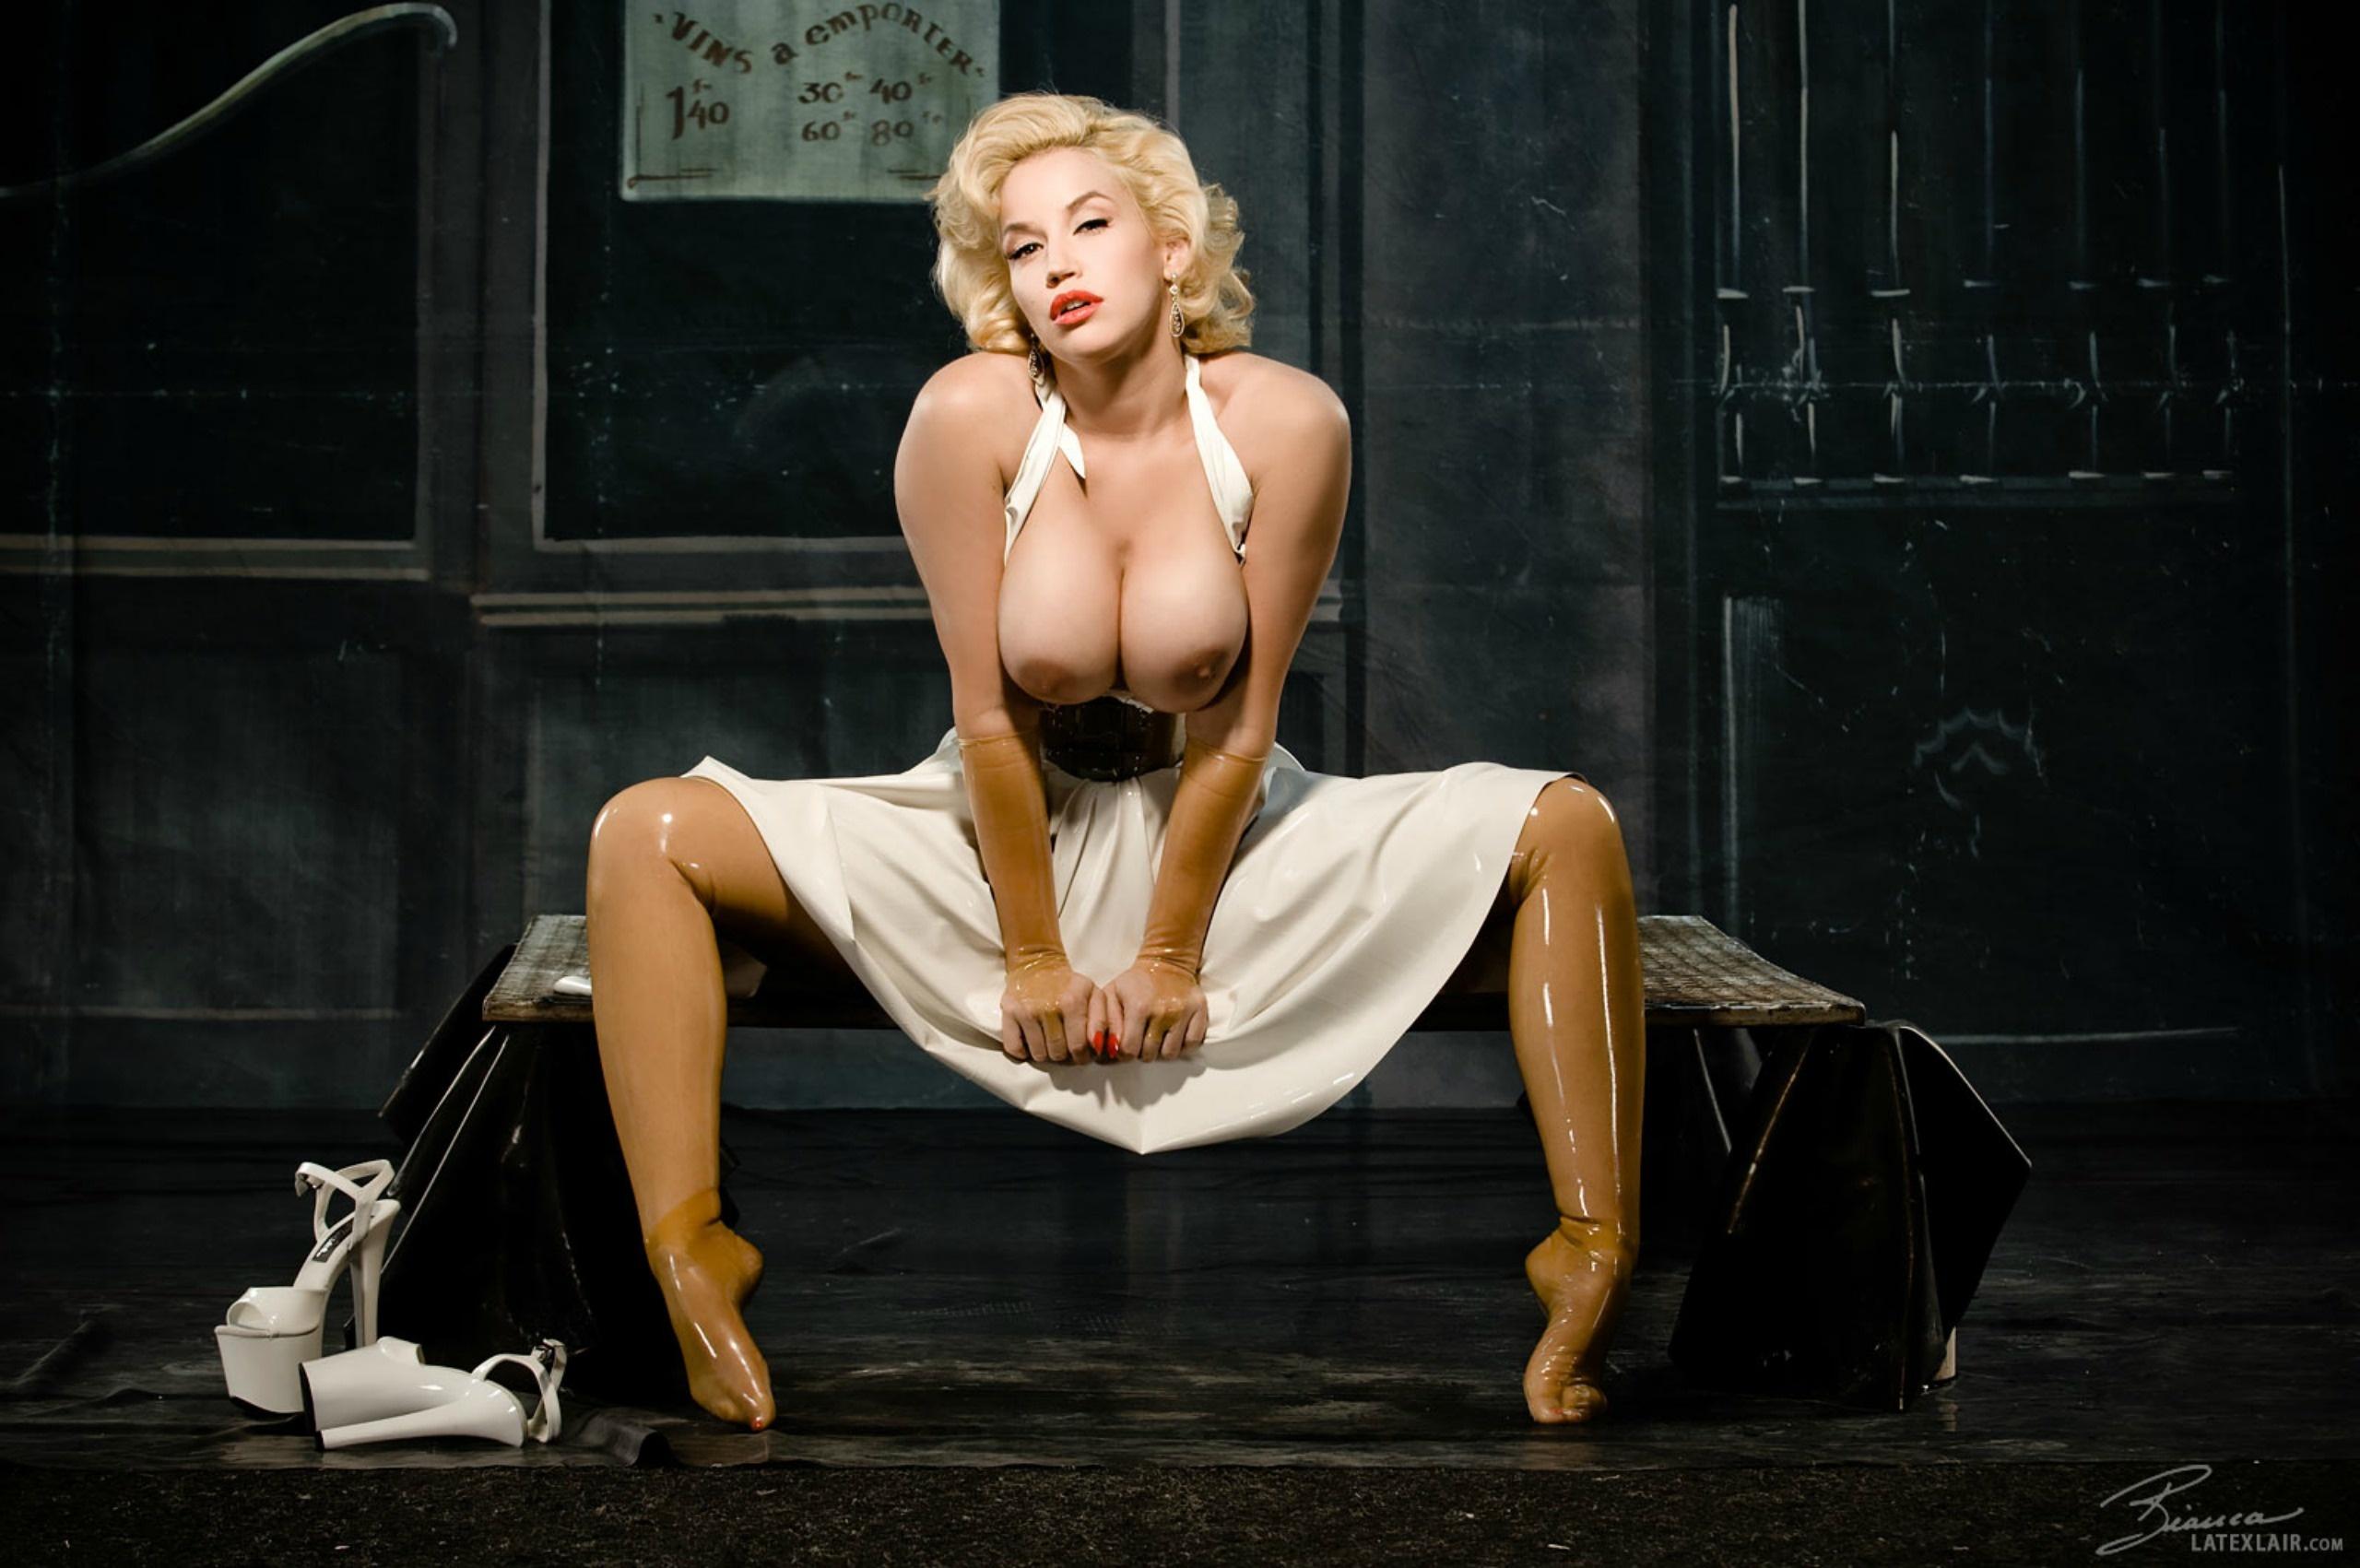 marilyn monroe tits